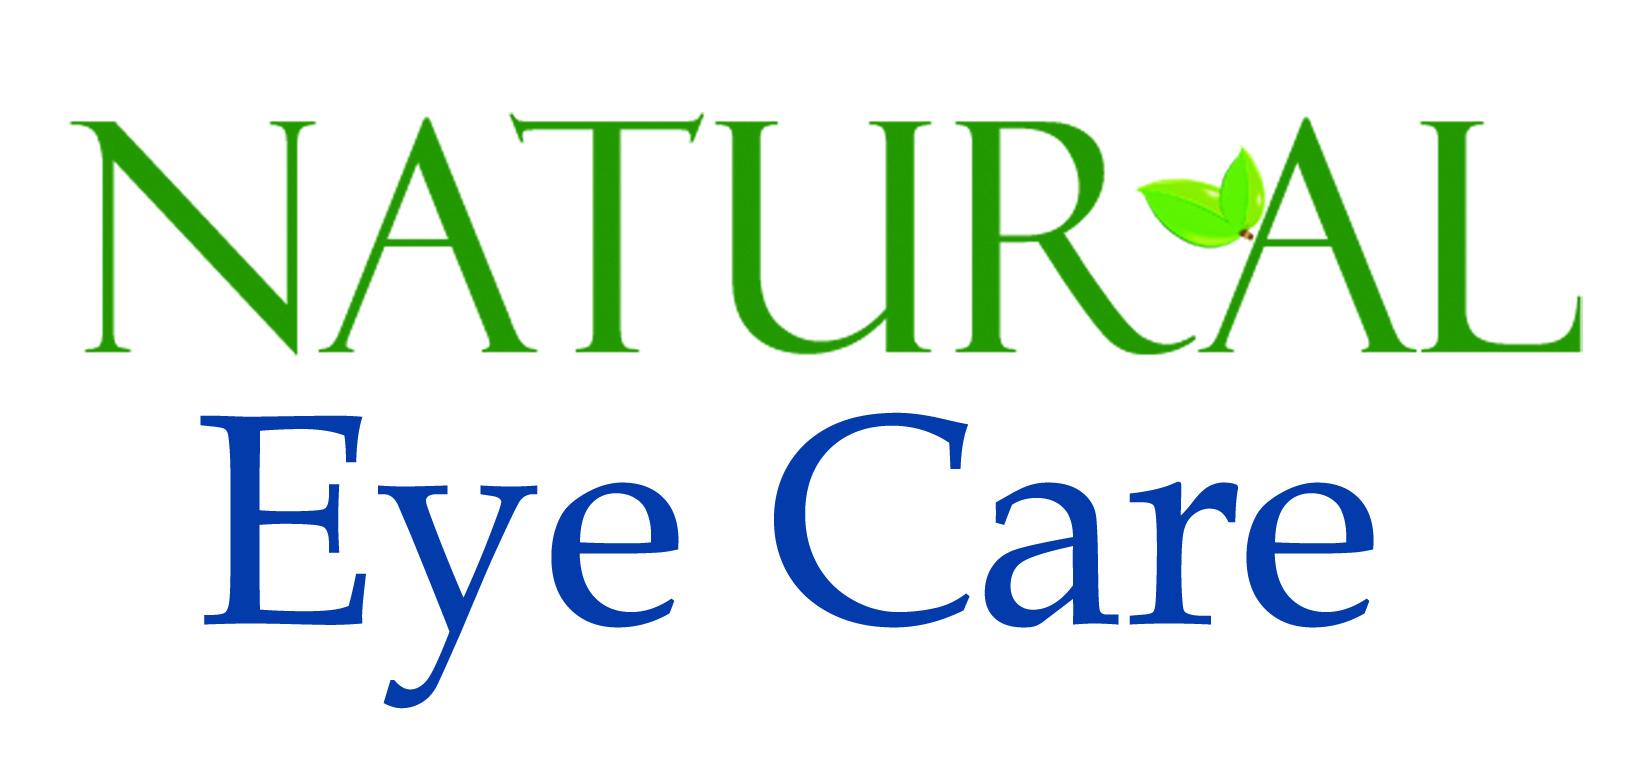 Natural Eye Care, Inc.